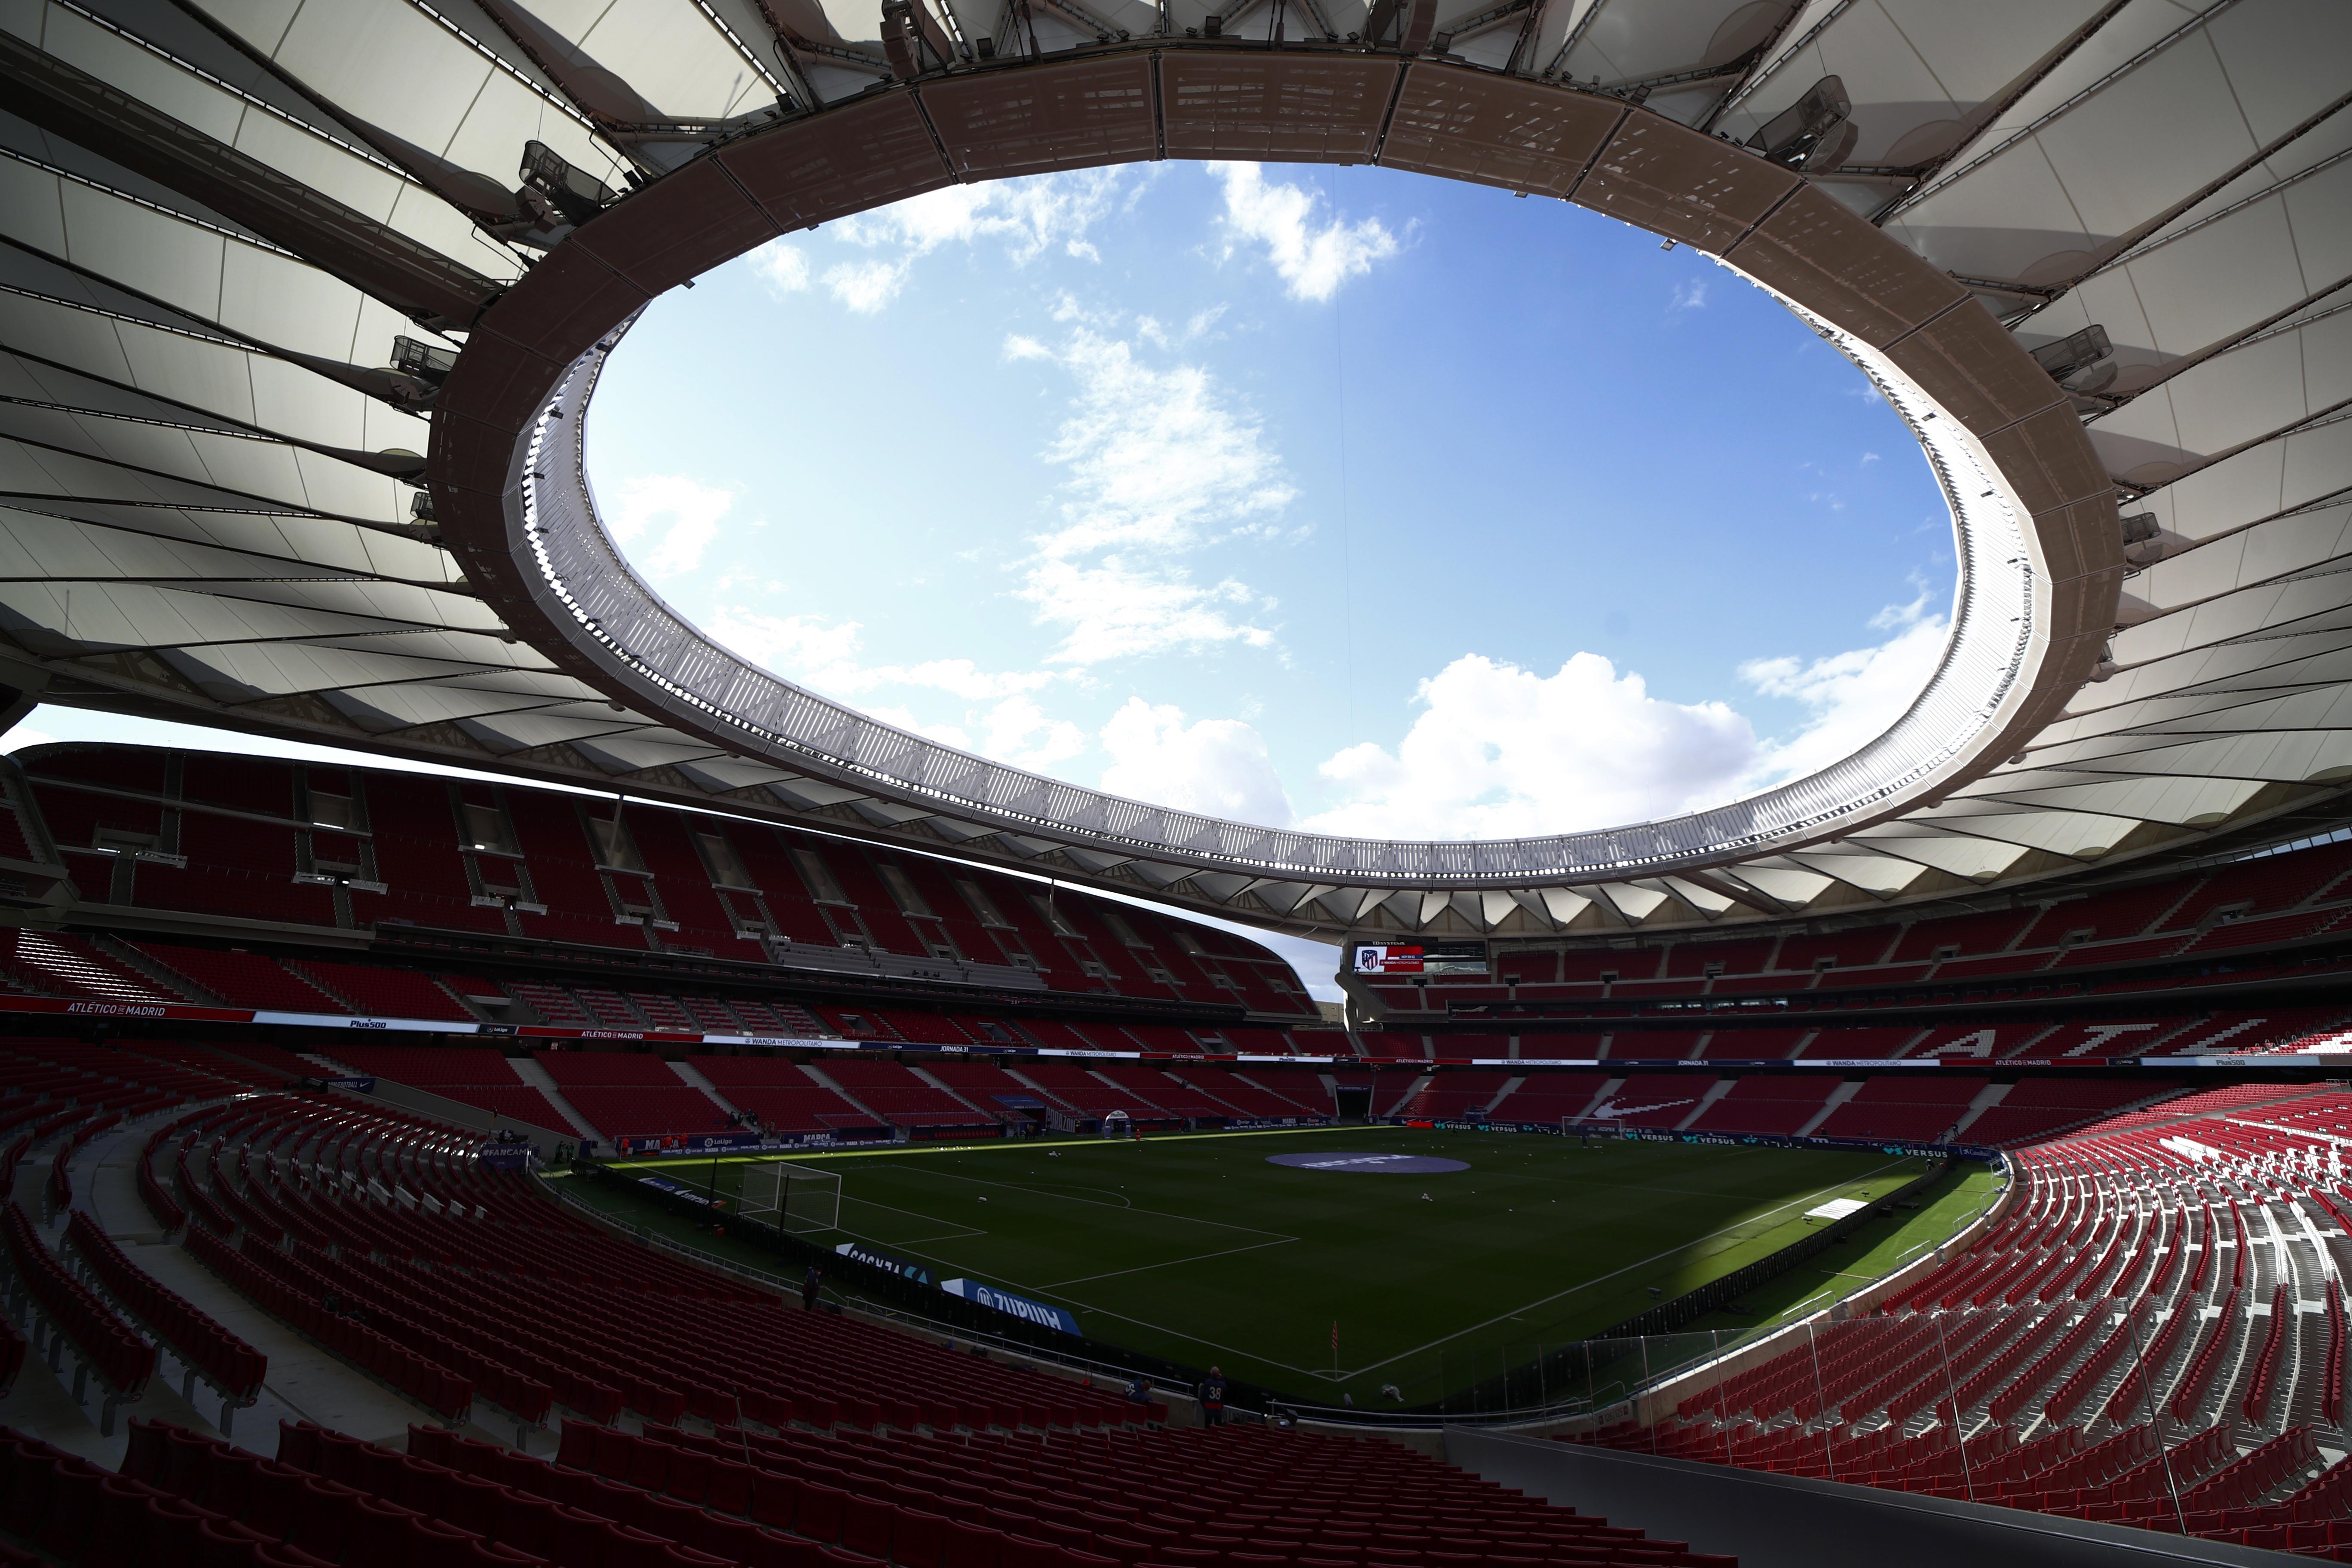 Soccer Football - La Liga Santander - Atletico Madrid v Huesca - Wanda Metropolitano, Madrid, Spain - April 22, 2021 General view inside the stadium before the match REUTERS/Sergio Perez